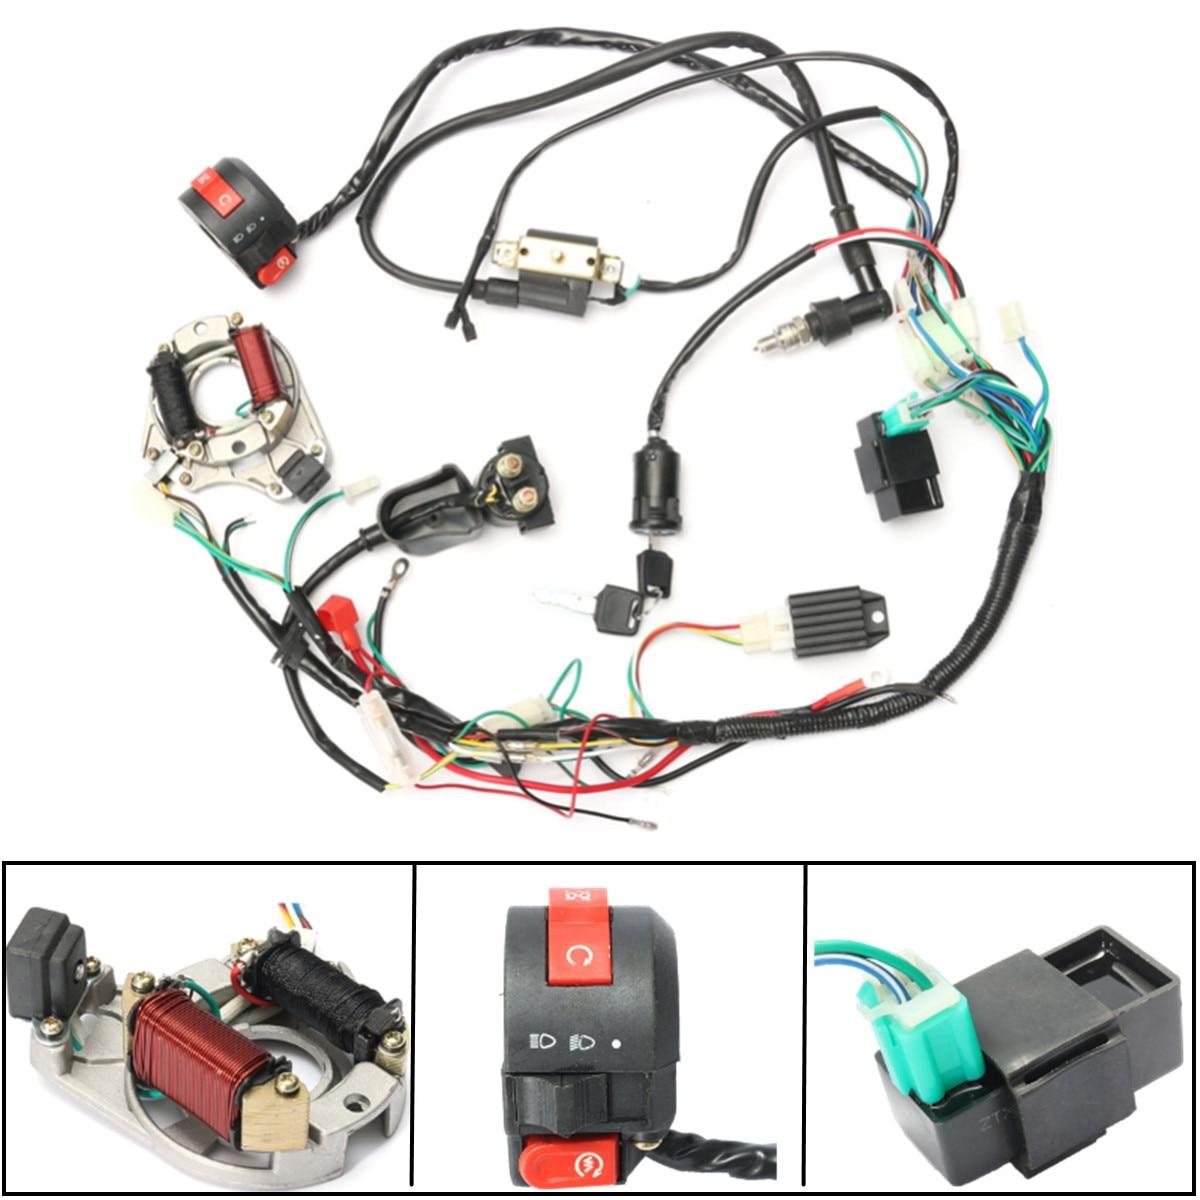 medium resolution of cdi wire harness stator assembly wiring for atv electric quad 50cc 70cc 90cc 110cc 125cc